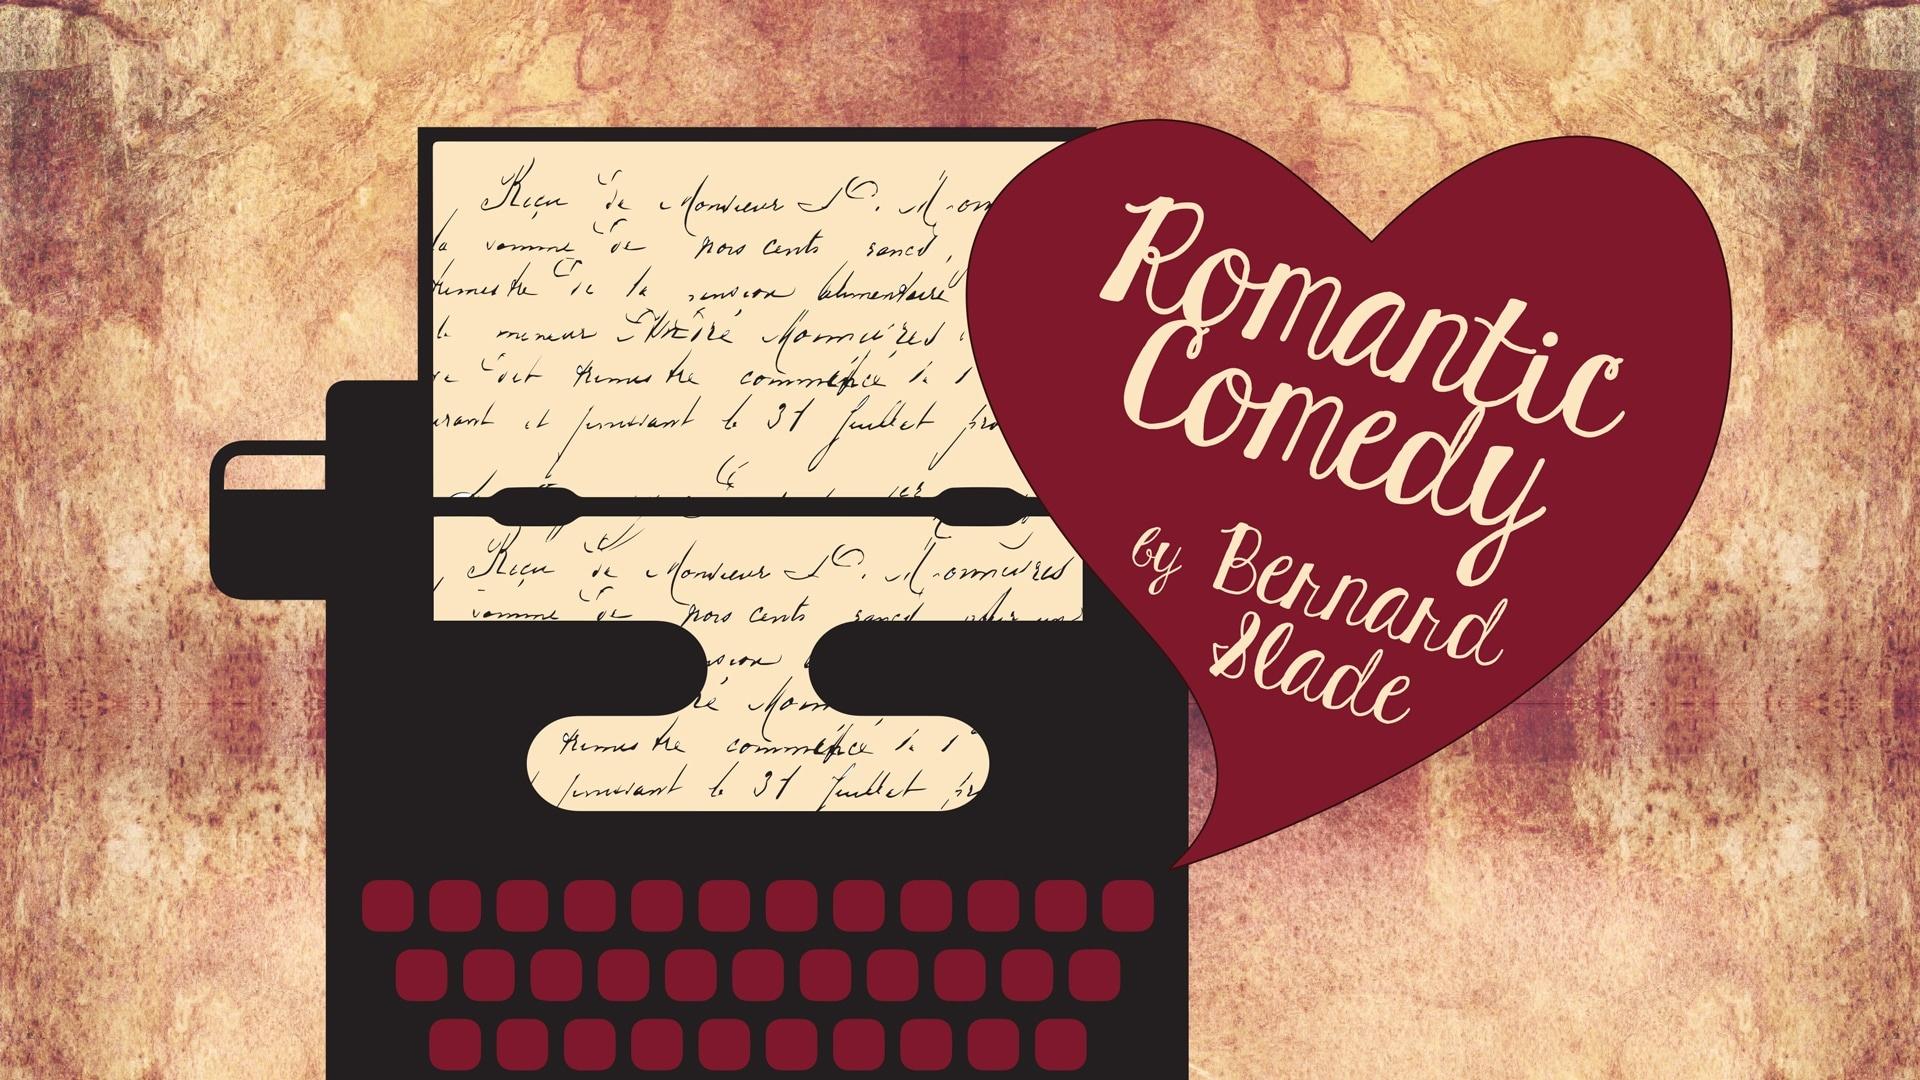 Romantic Comedy by Bernard Slade - show graphic